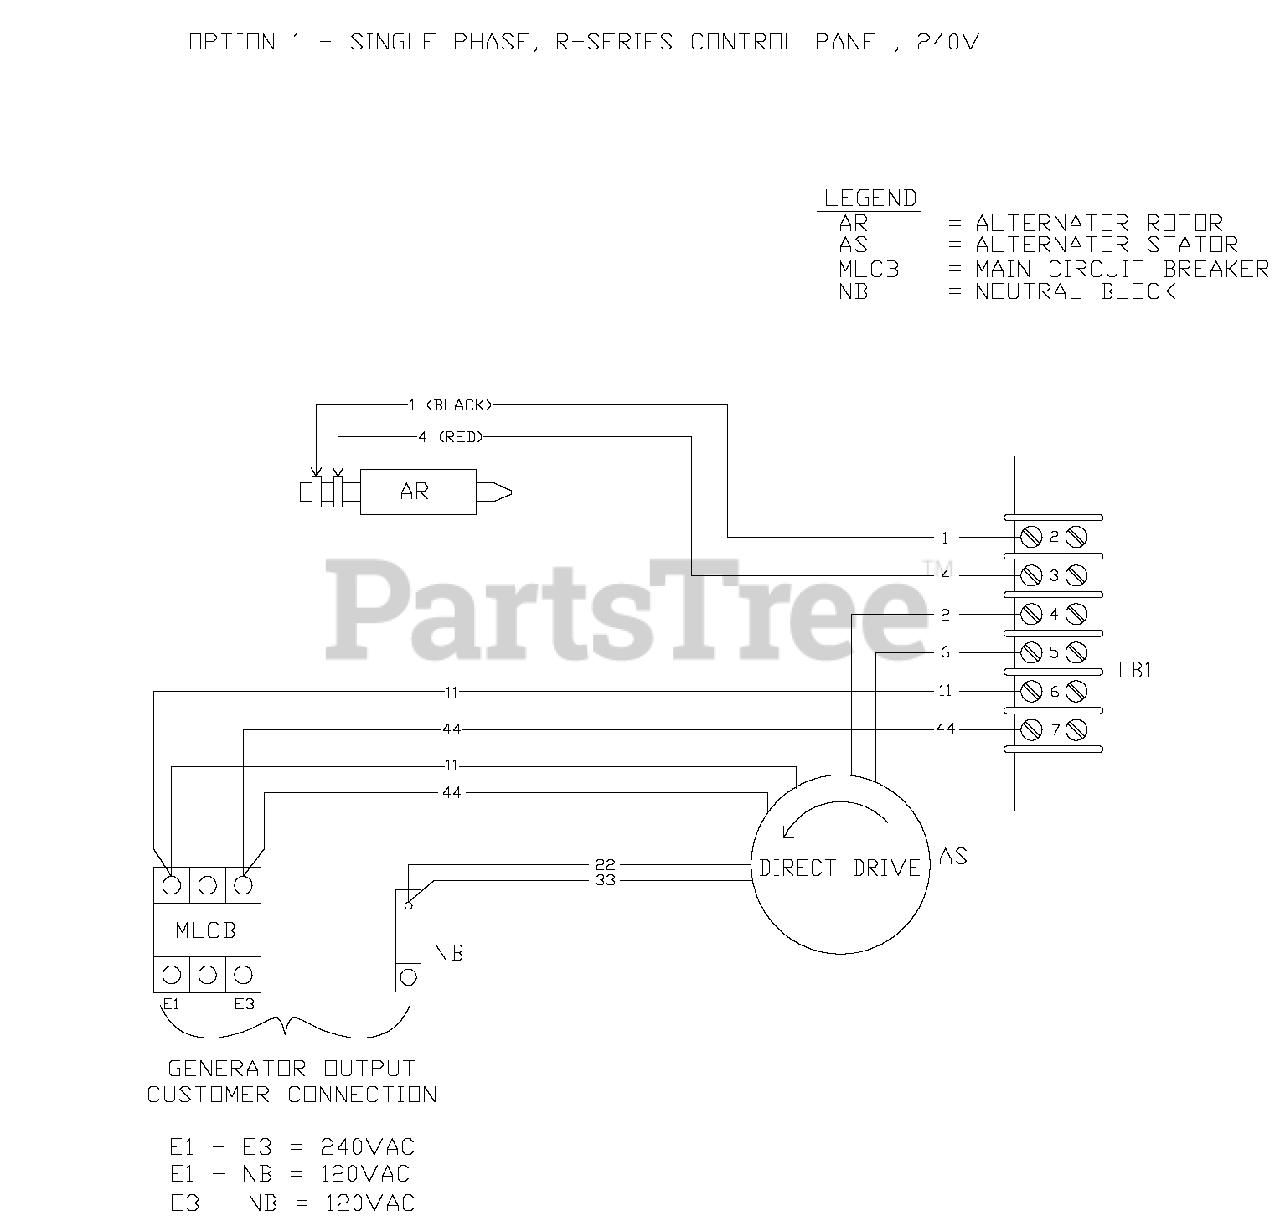 Generac QT03016JNSN - Generac 30kW Home Standby Generator (SN: 5057983 -  5128024) (2008) Wiring Diagram (0F6839) Parts Lookup with Diagrams |  PartsTree | Generac 30 Kw Wiring Diagram |  | PartsTree